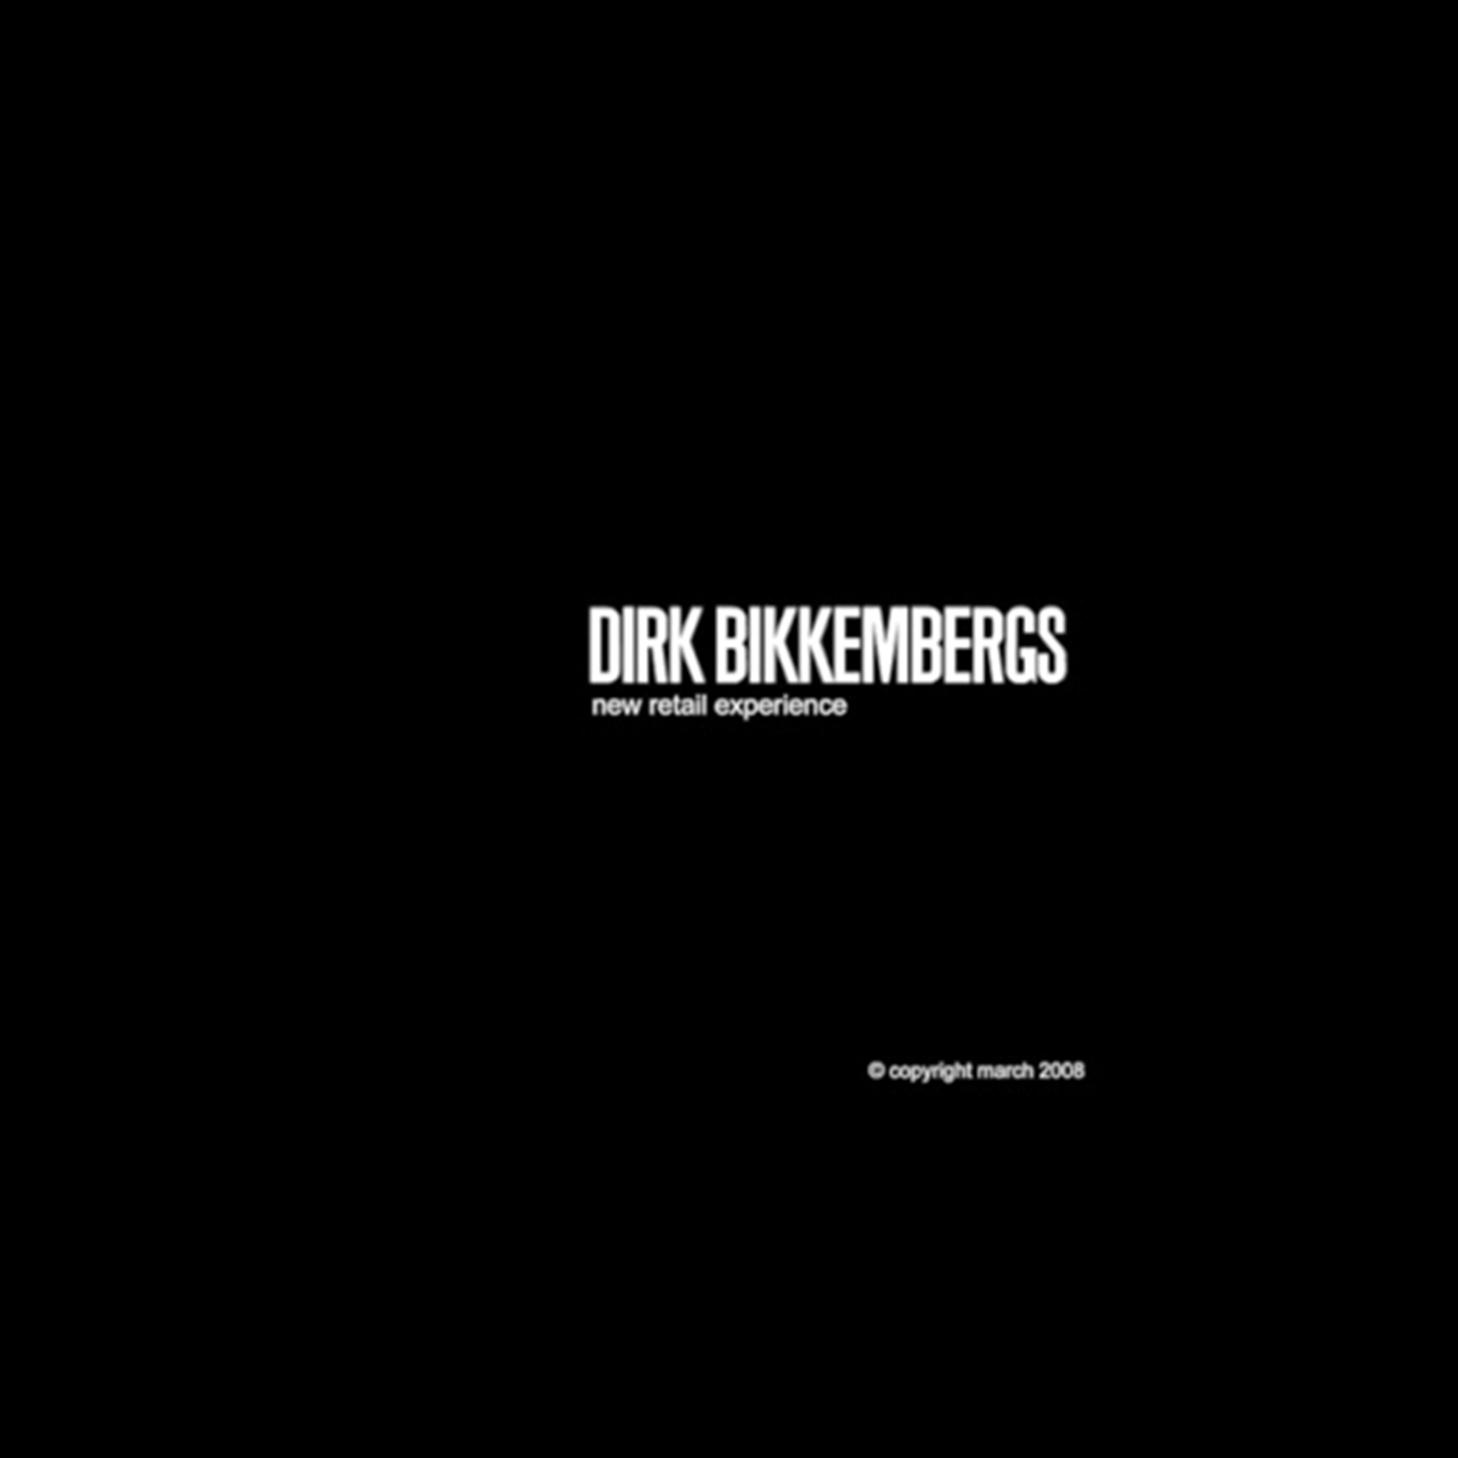 DIRK BIKKEMBERG VIDEO